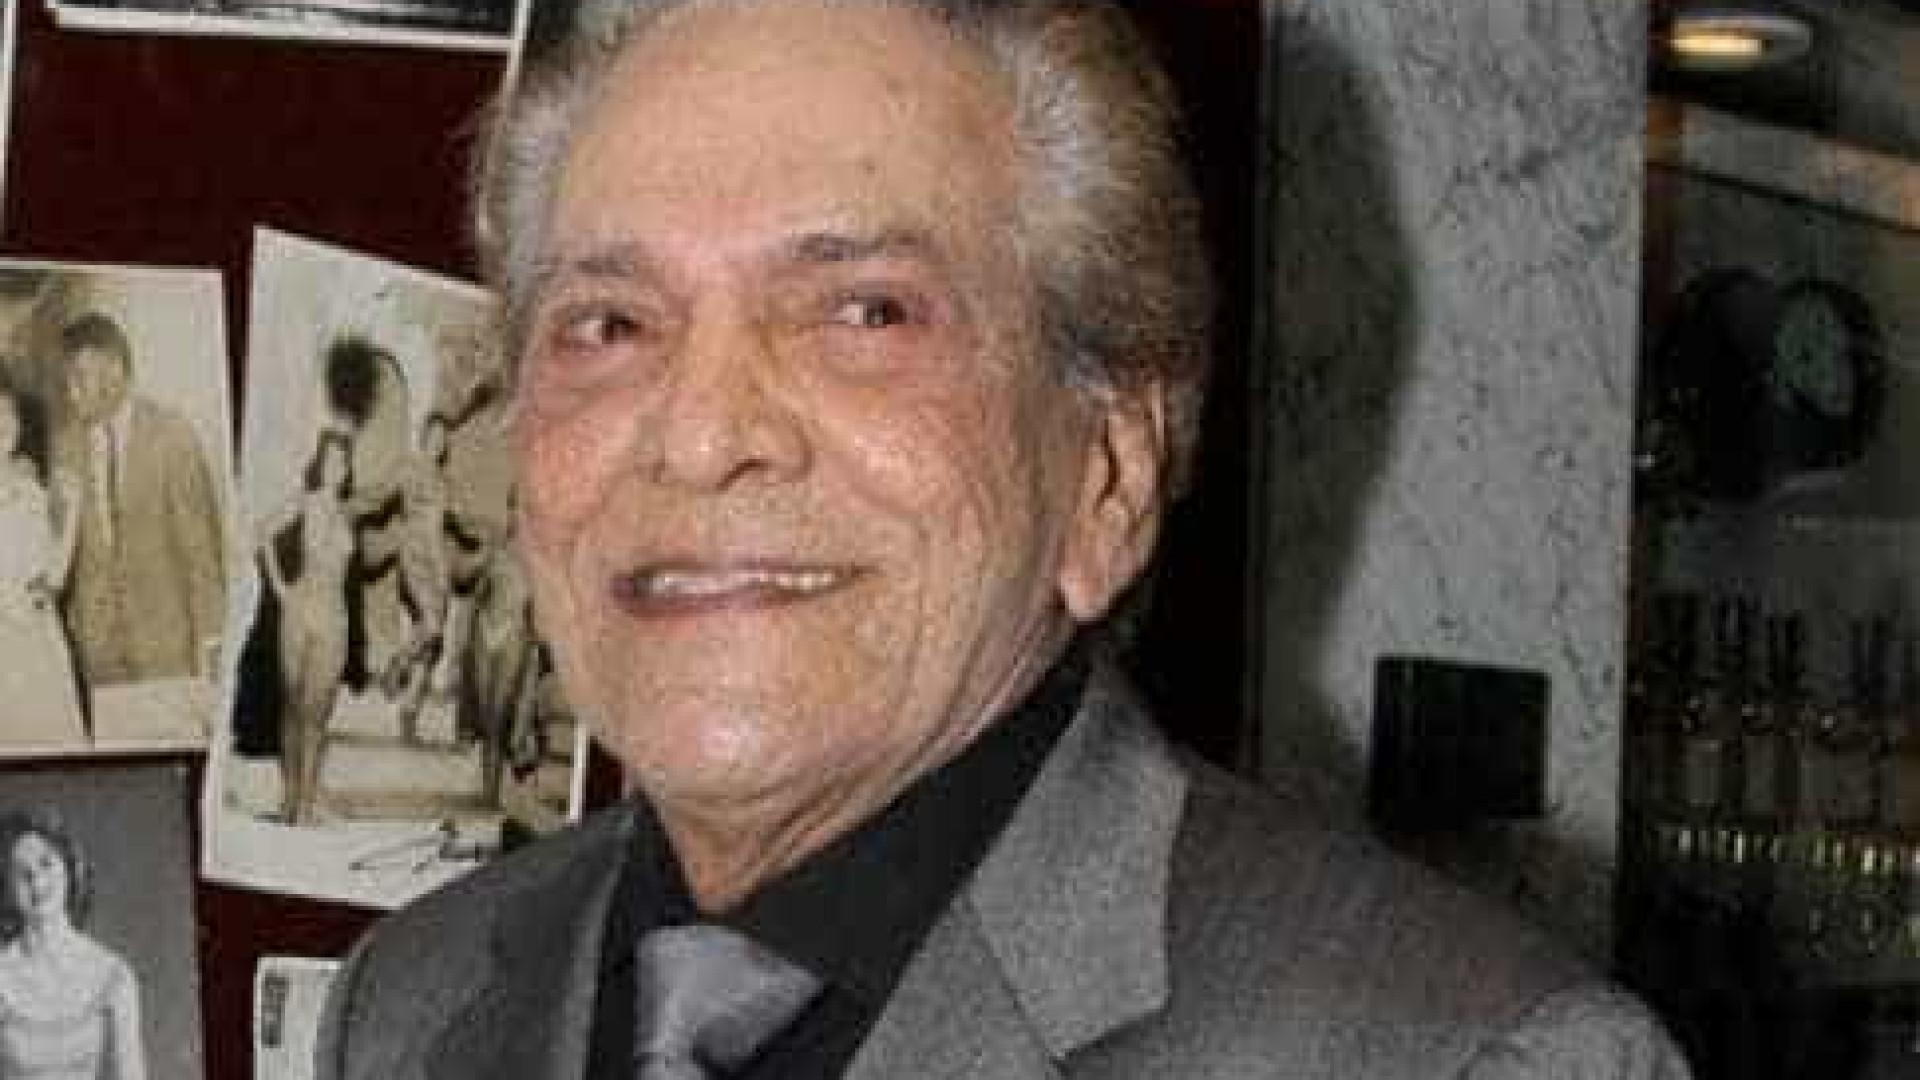 Aos 90 anos, Lúcio Mauro é internado no Rio de Janeiro